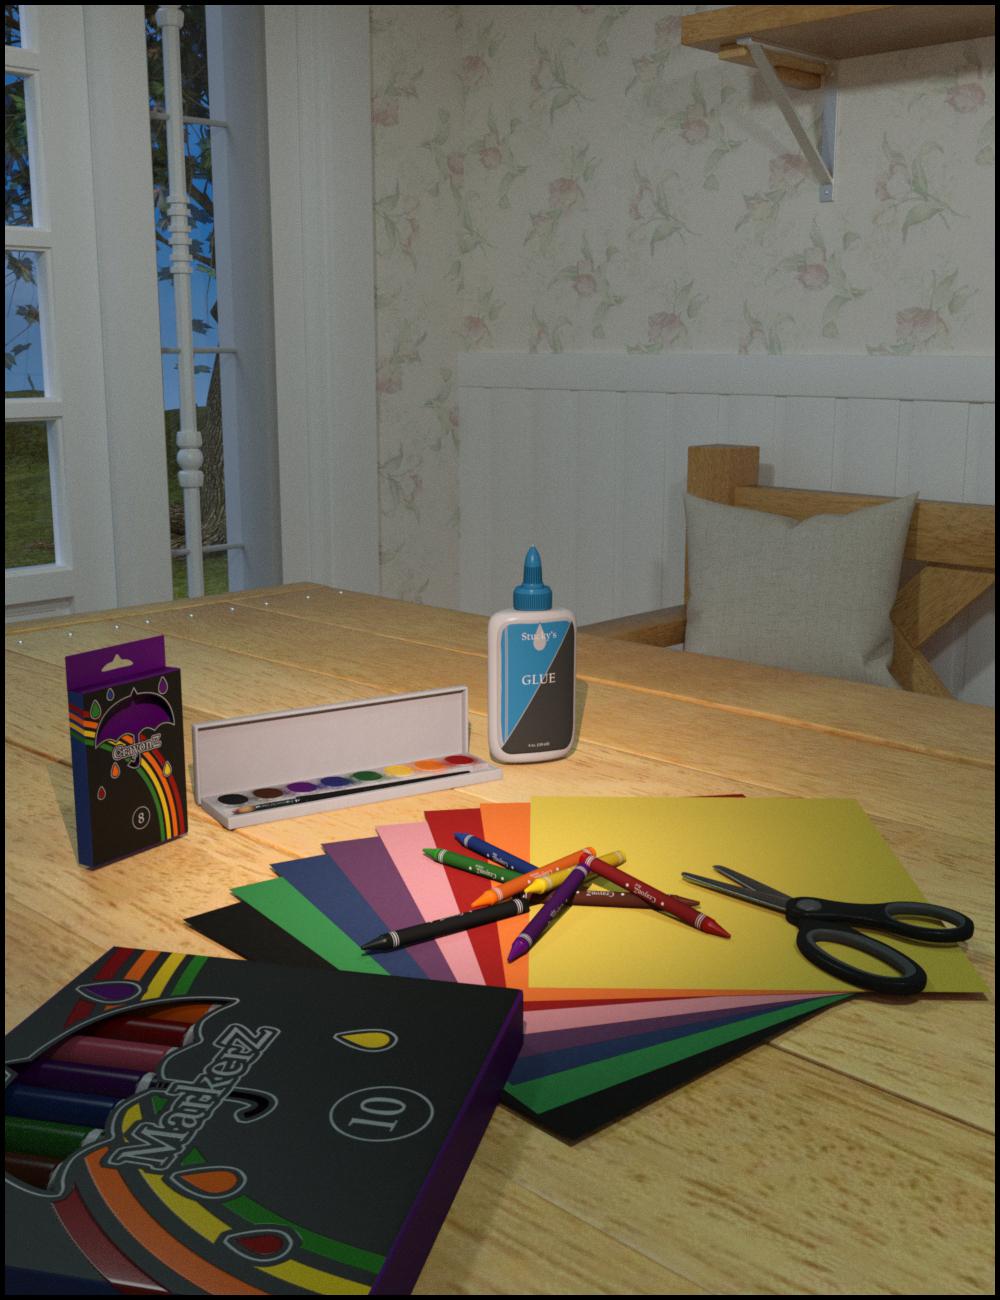 School Craft Supplies by: ARTCollab, 3D Models by Daz 3D